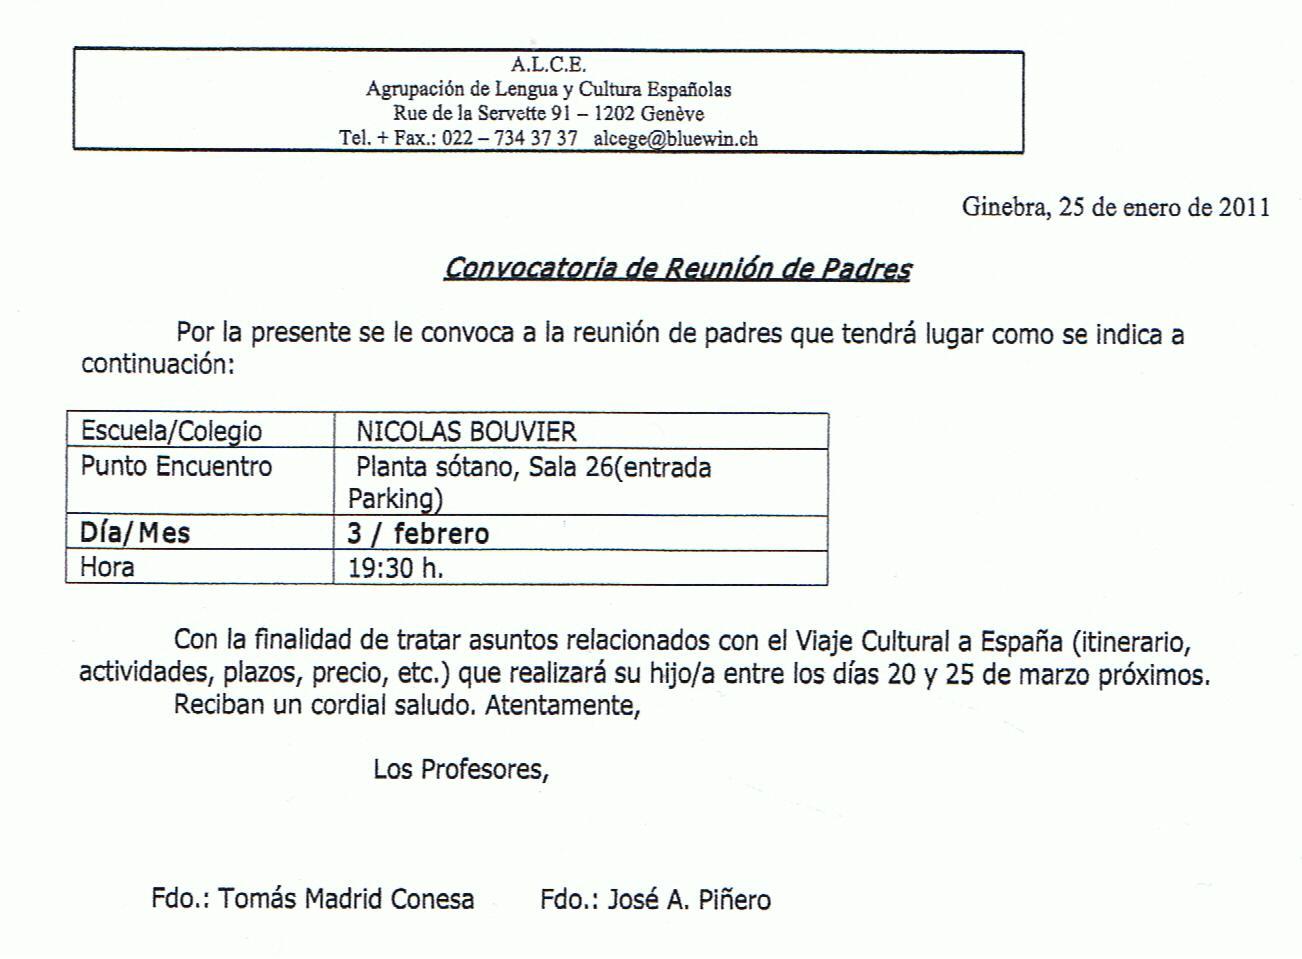 ALUMNOS DE ESPAÑOL (4.2A,B,C y 4.3-B,C,E) EN LA A.L.C.E. de Ginebra ...